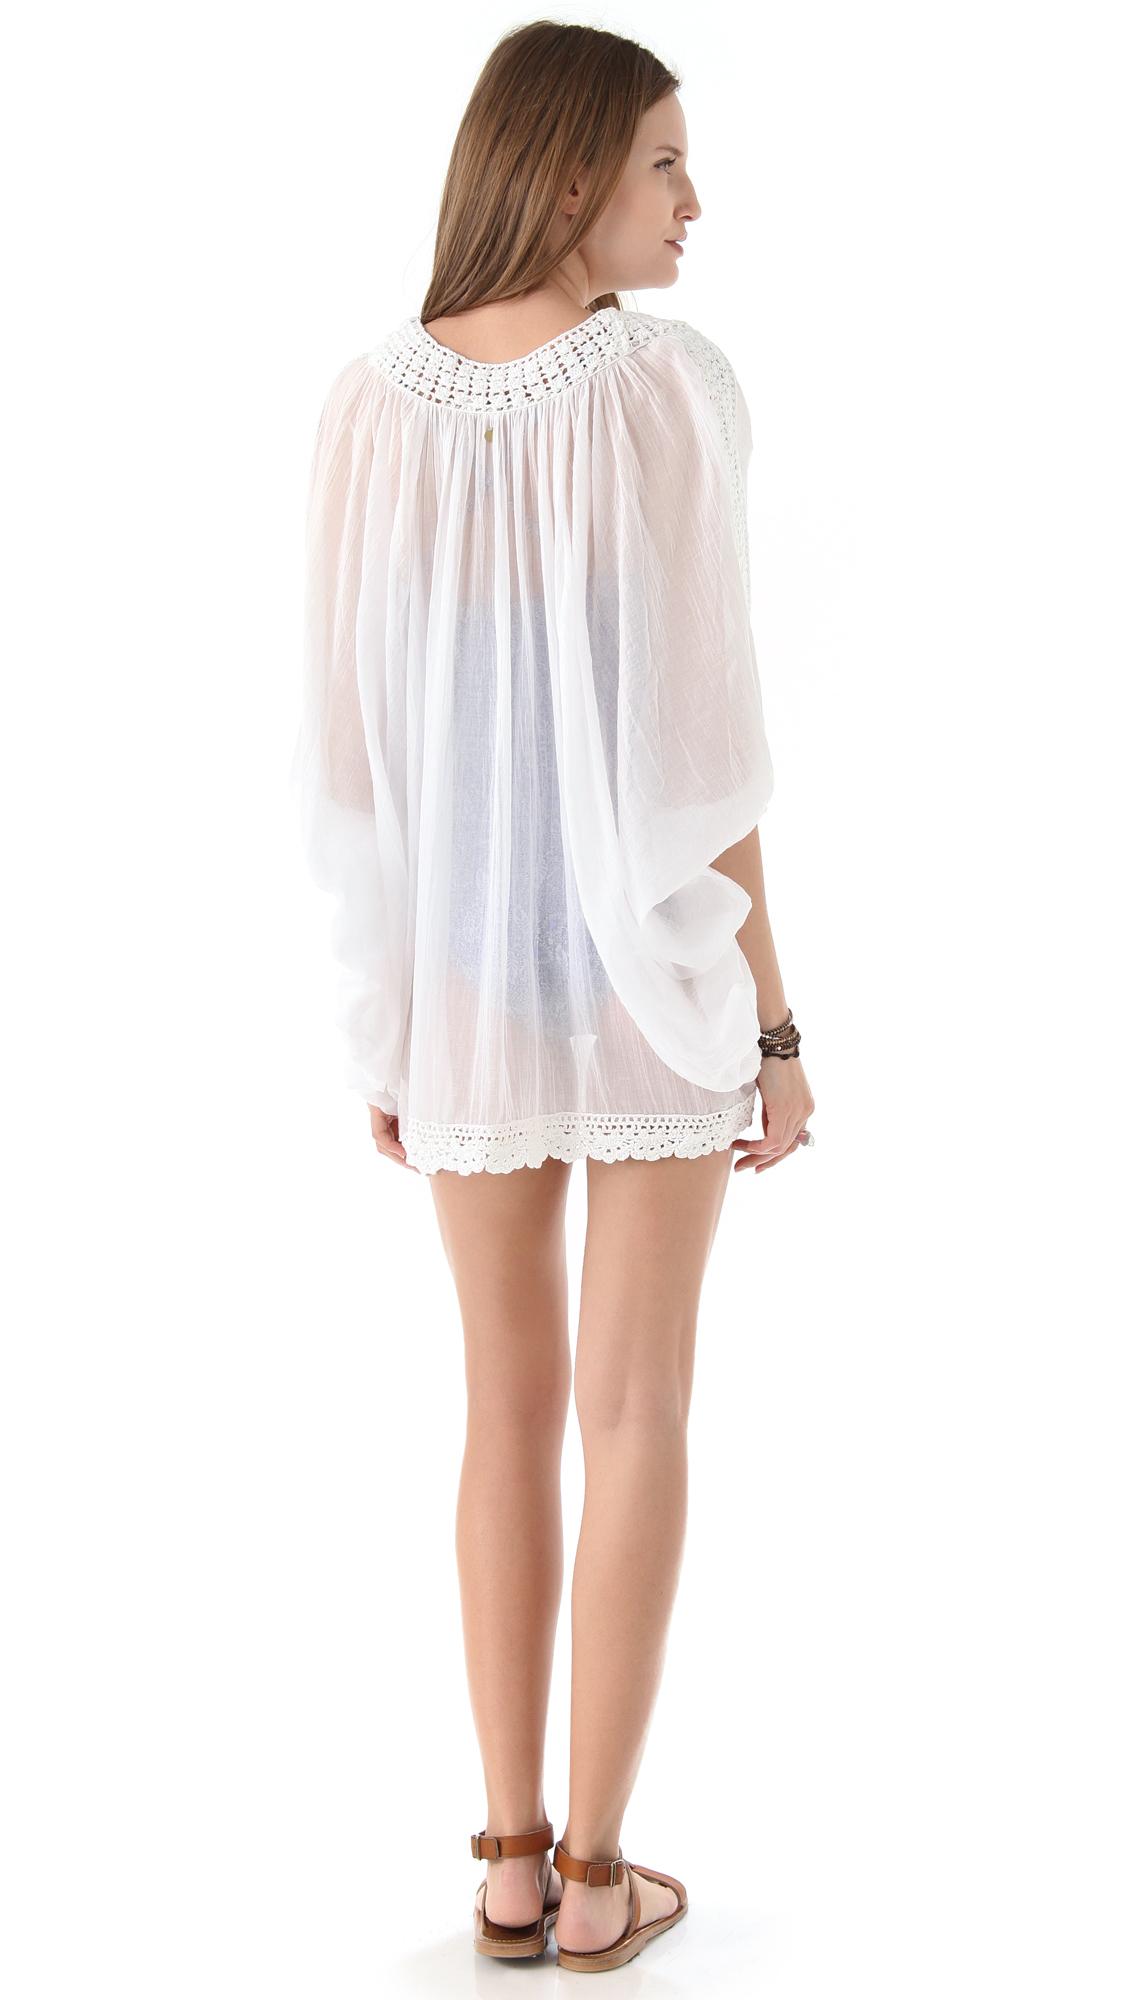 c40d7ad709bd Lyst - Ondademar Crochet Cover Up Dress in White